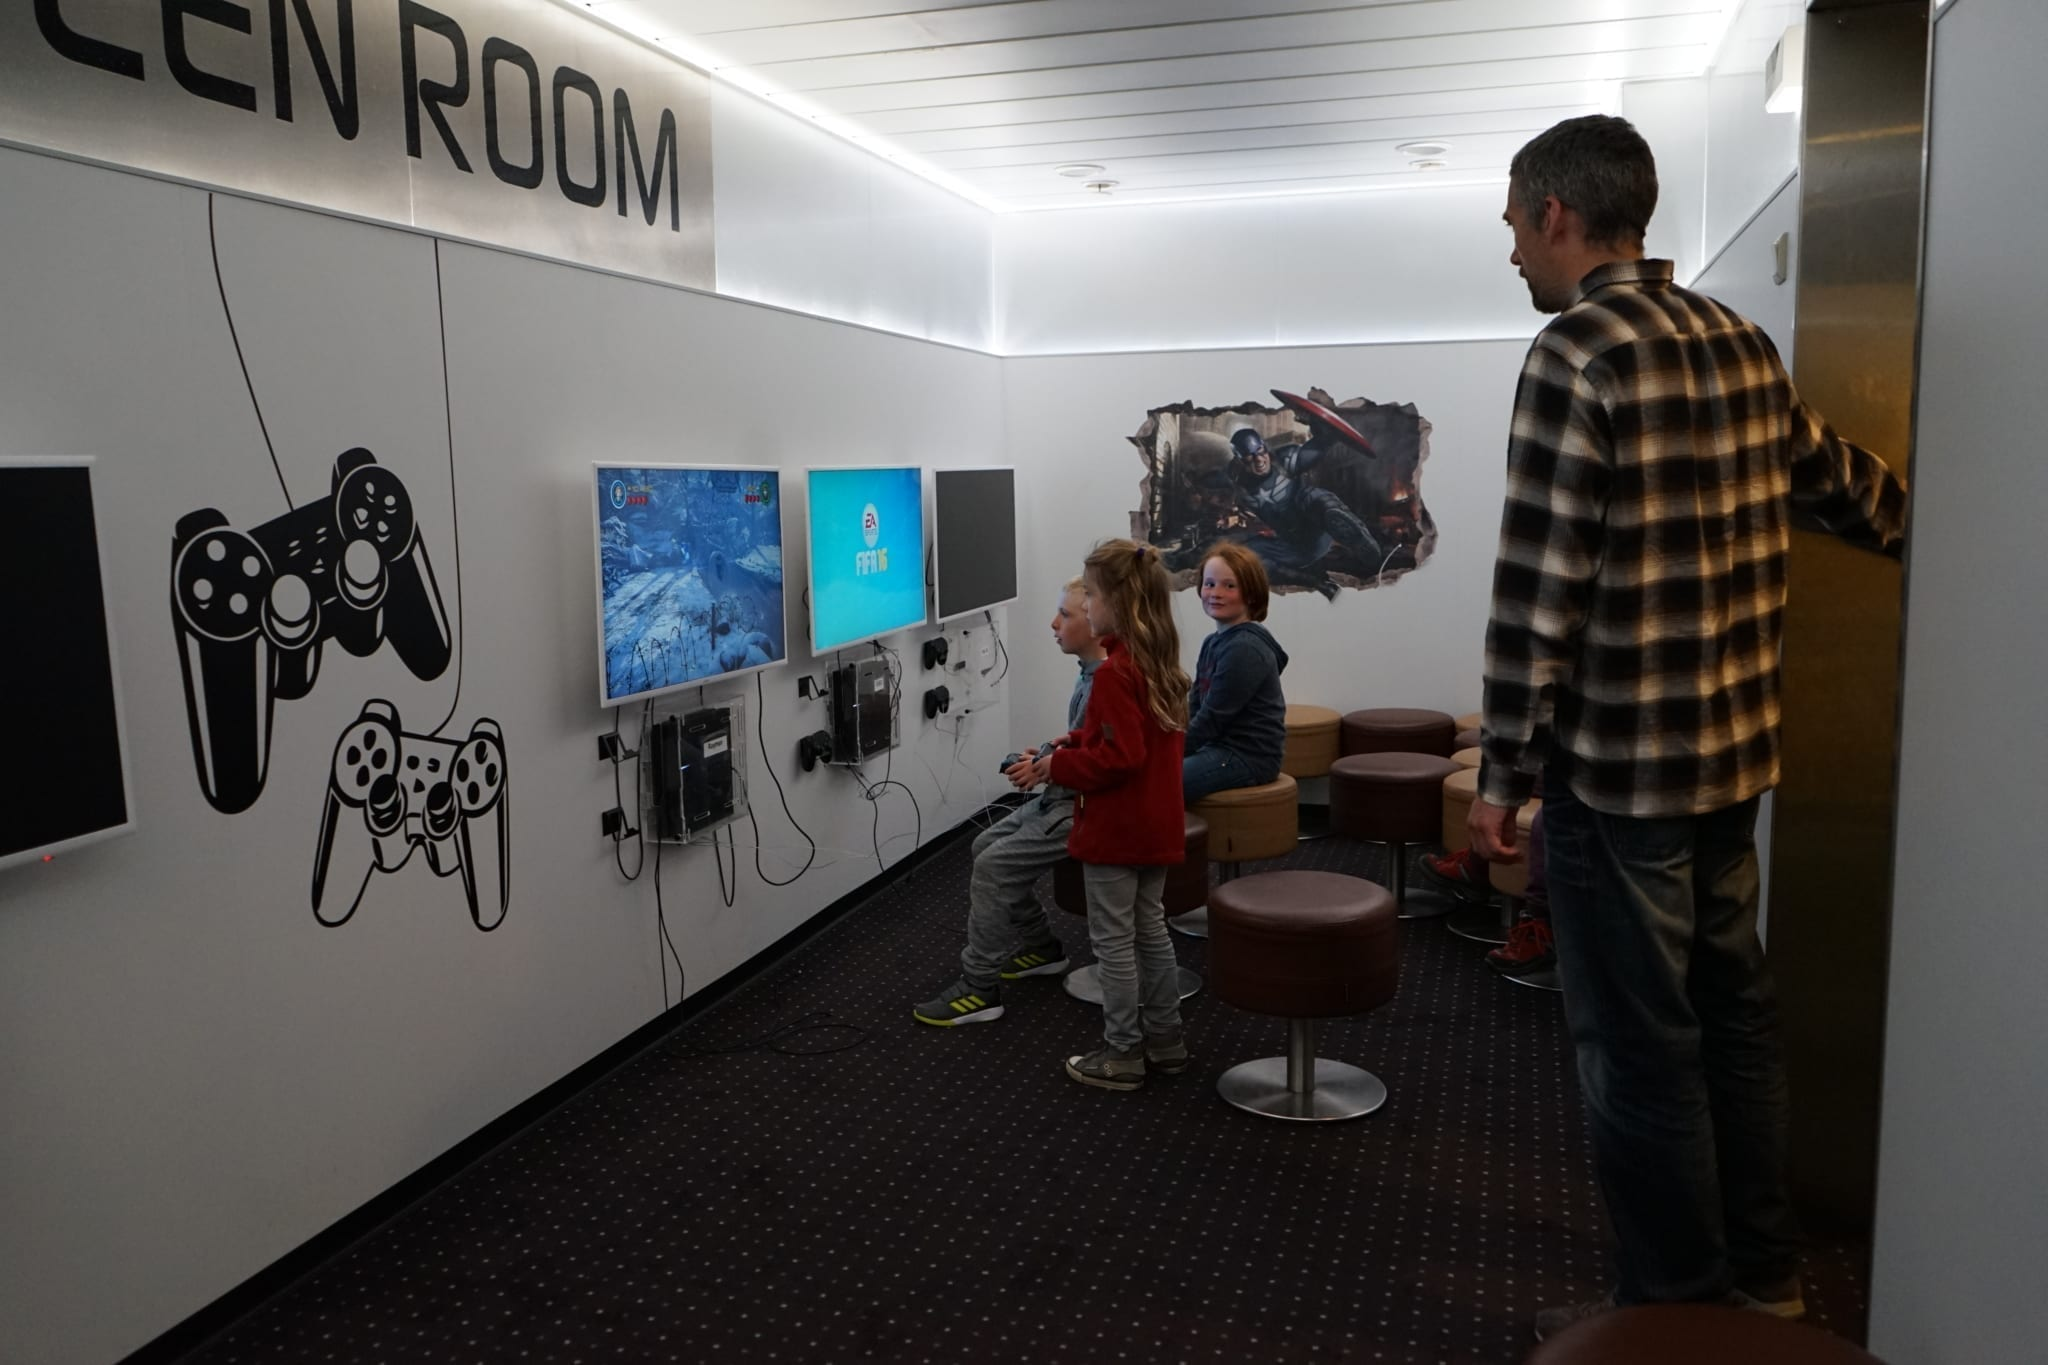 Teen Room Norröna Smyril Line